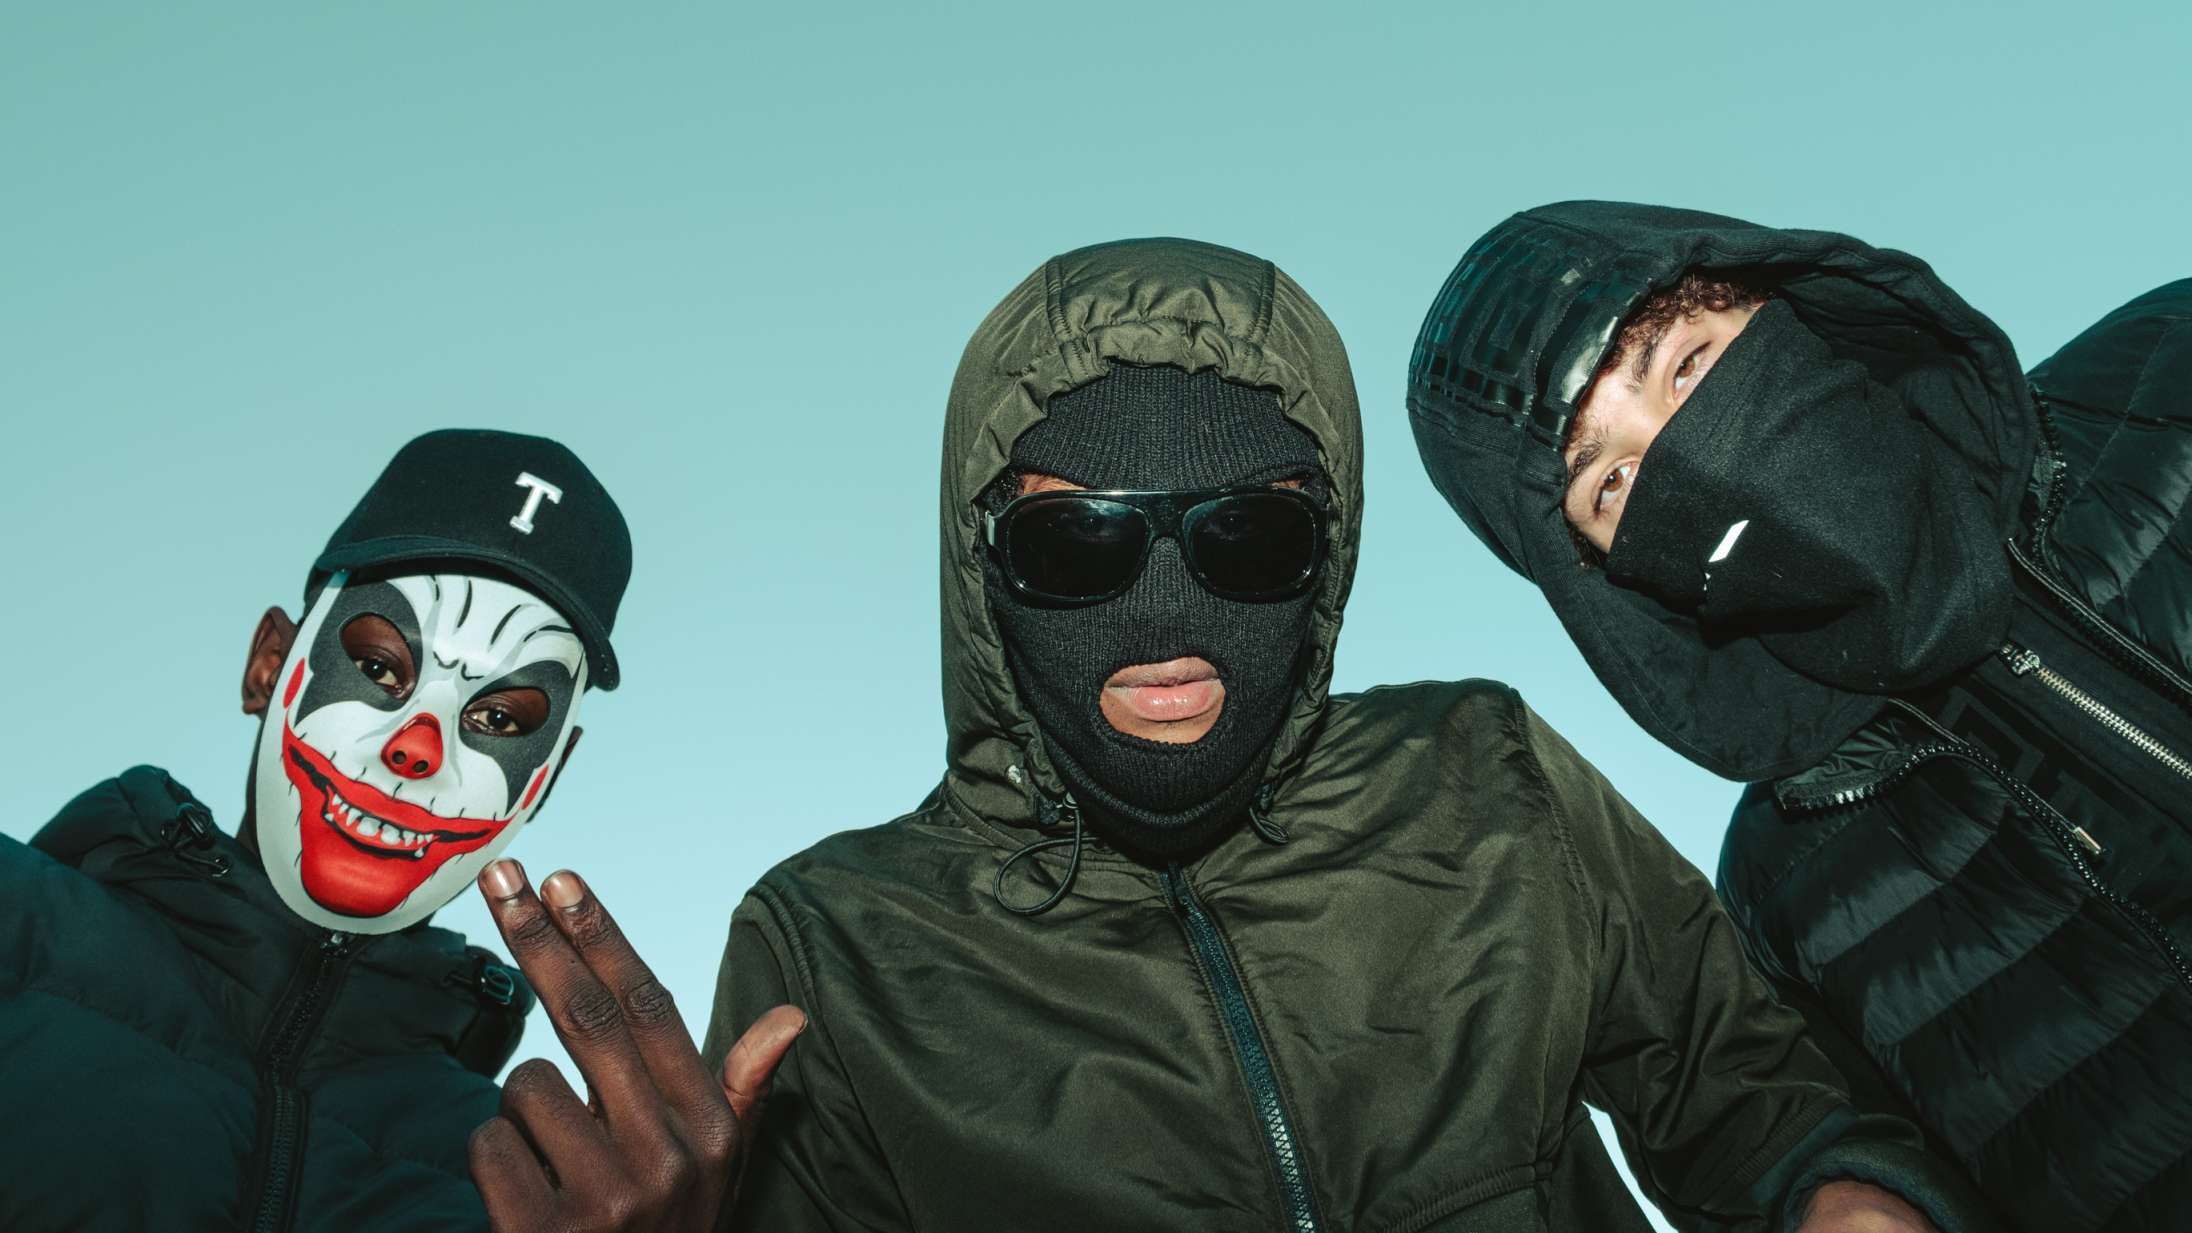 Verdens farligste genre er kommet til Danmark: Sådan går drill-musikken og vold hånd i hånd